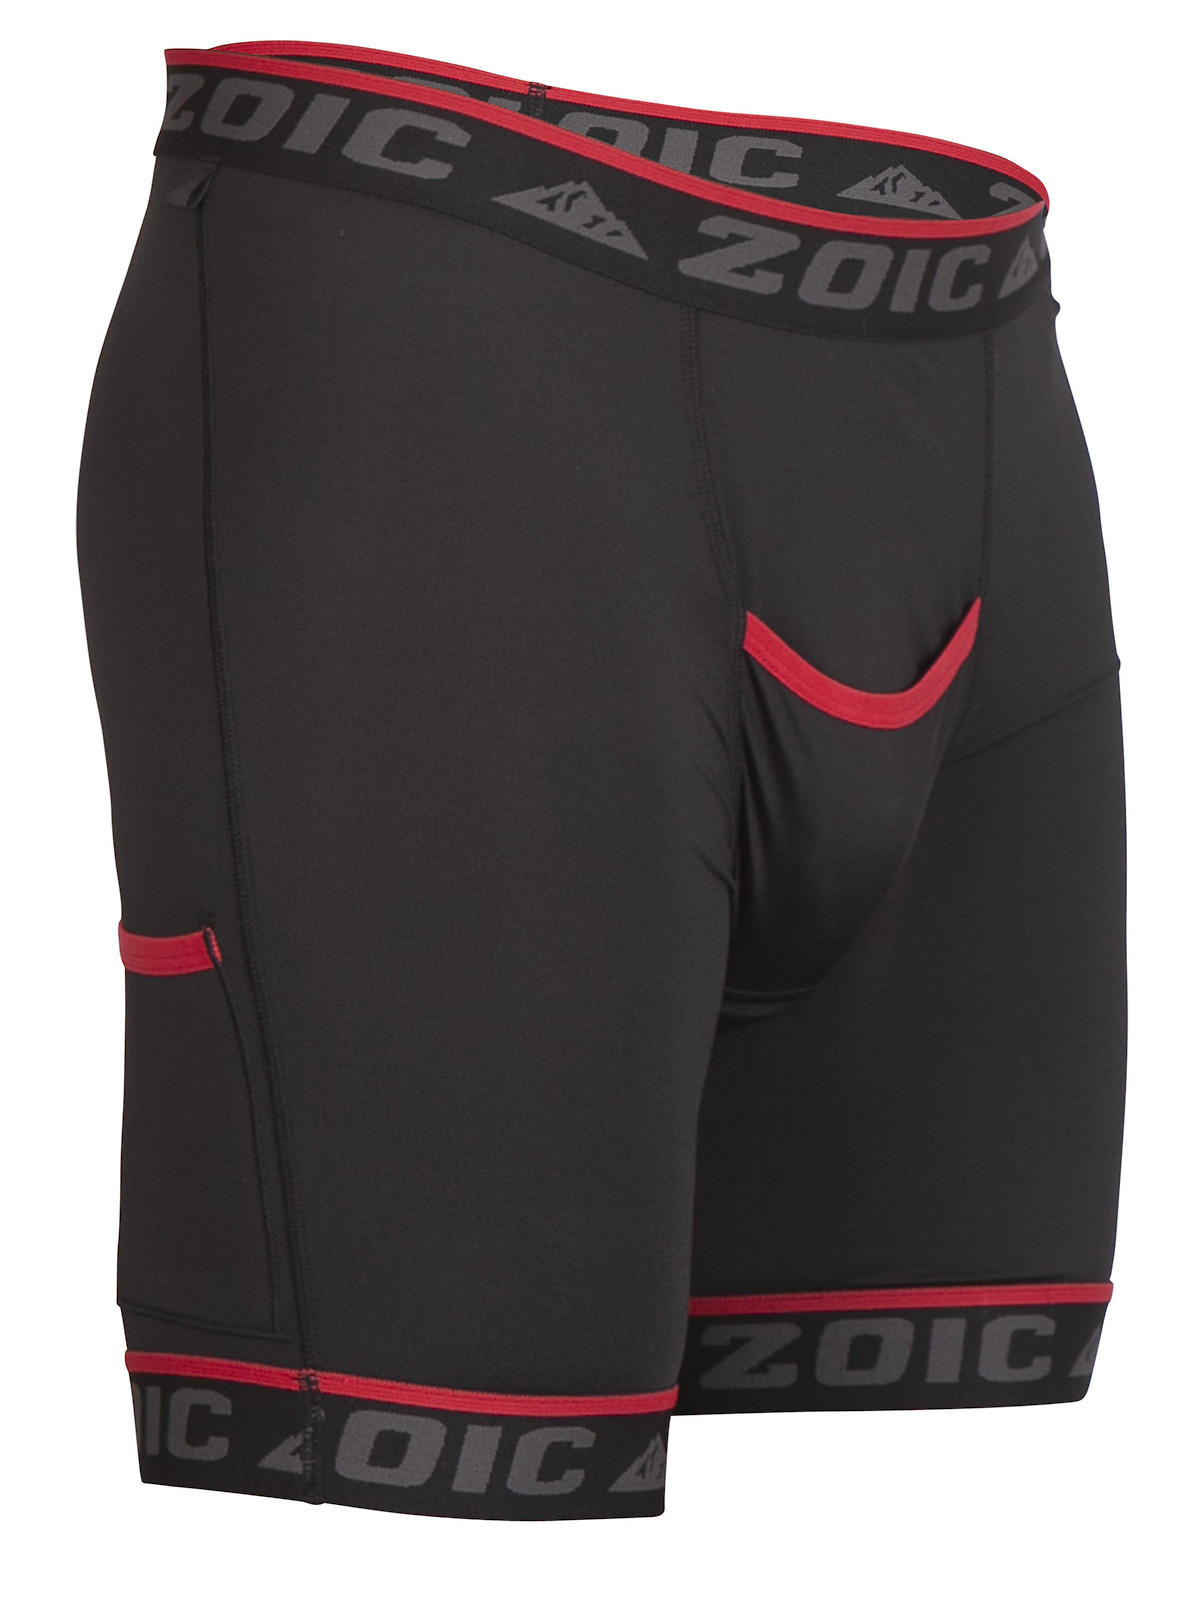 Zoic Essential Liner Short